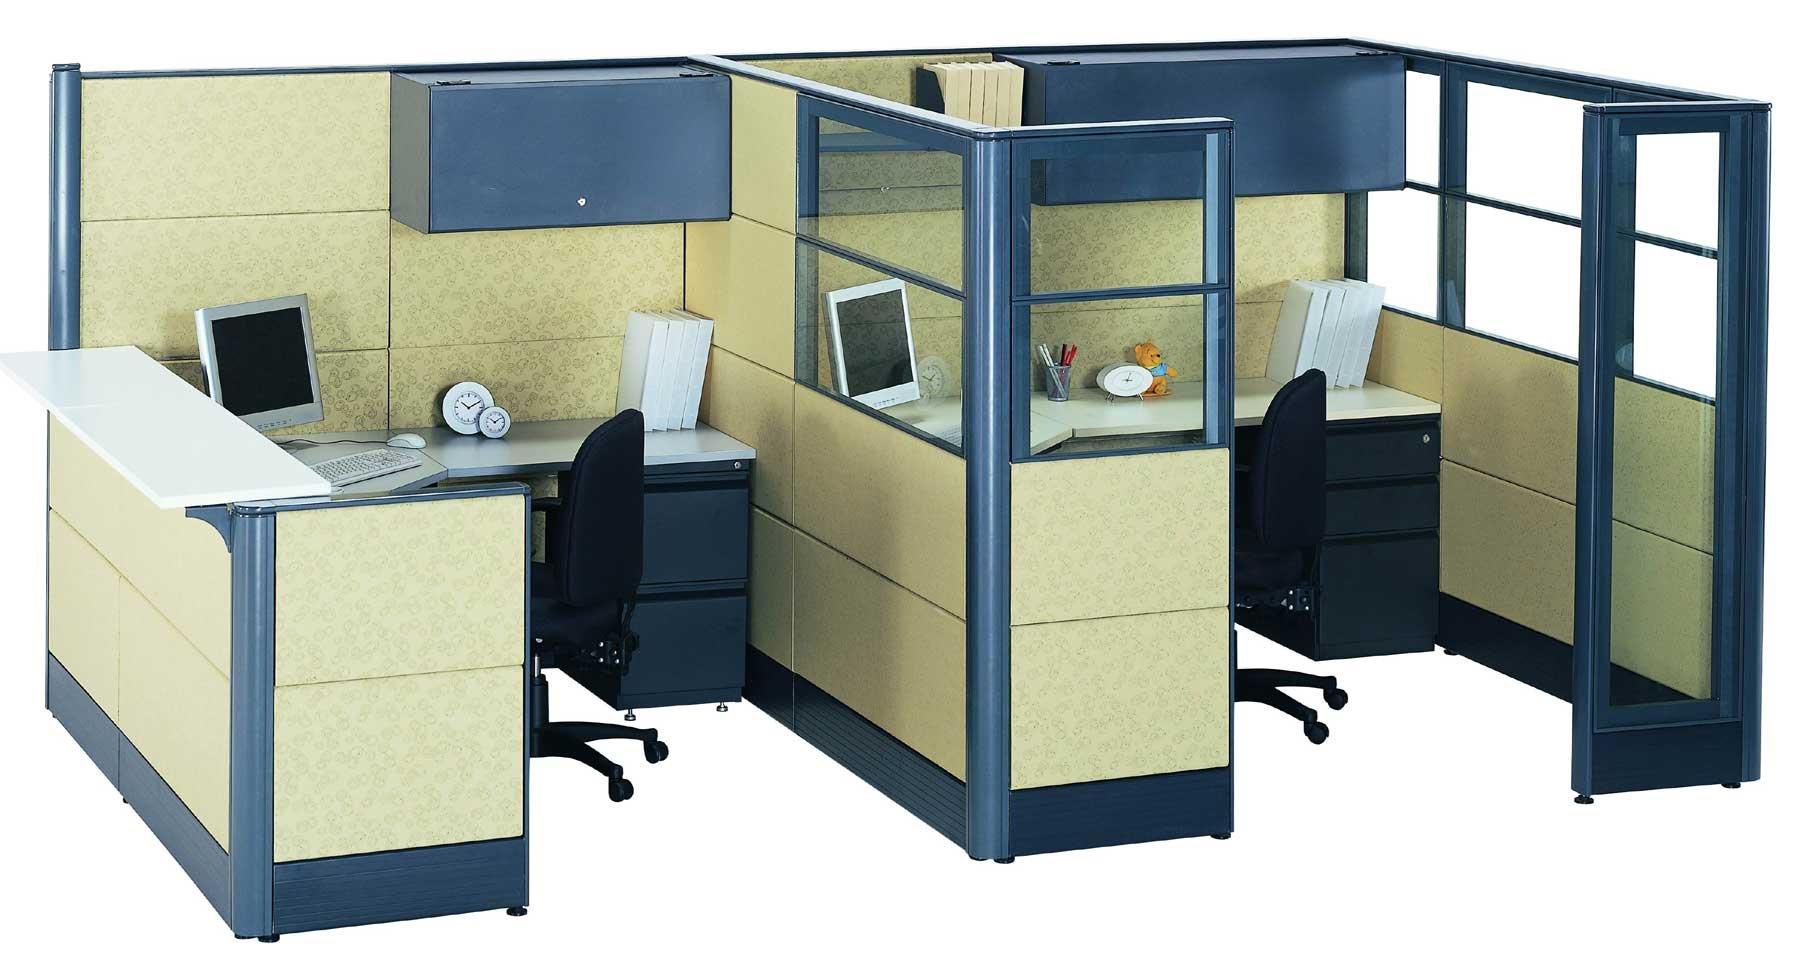 cubicle walls